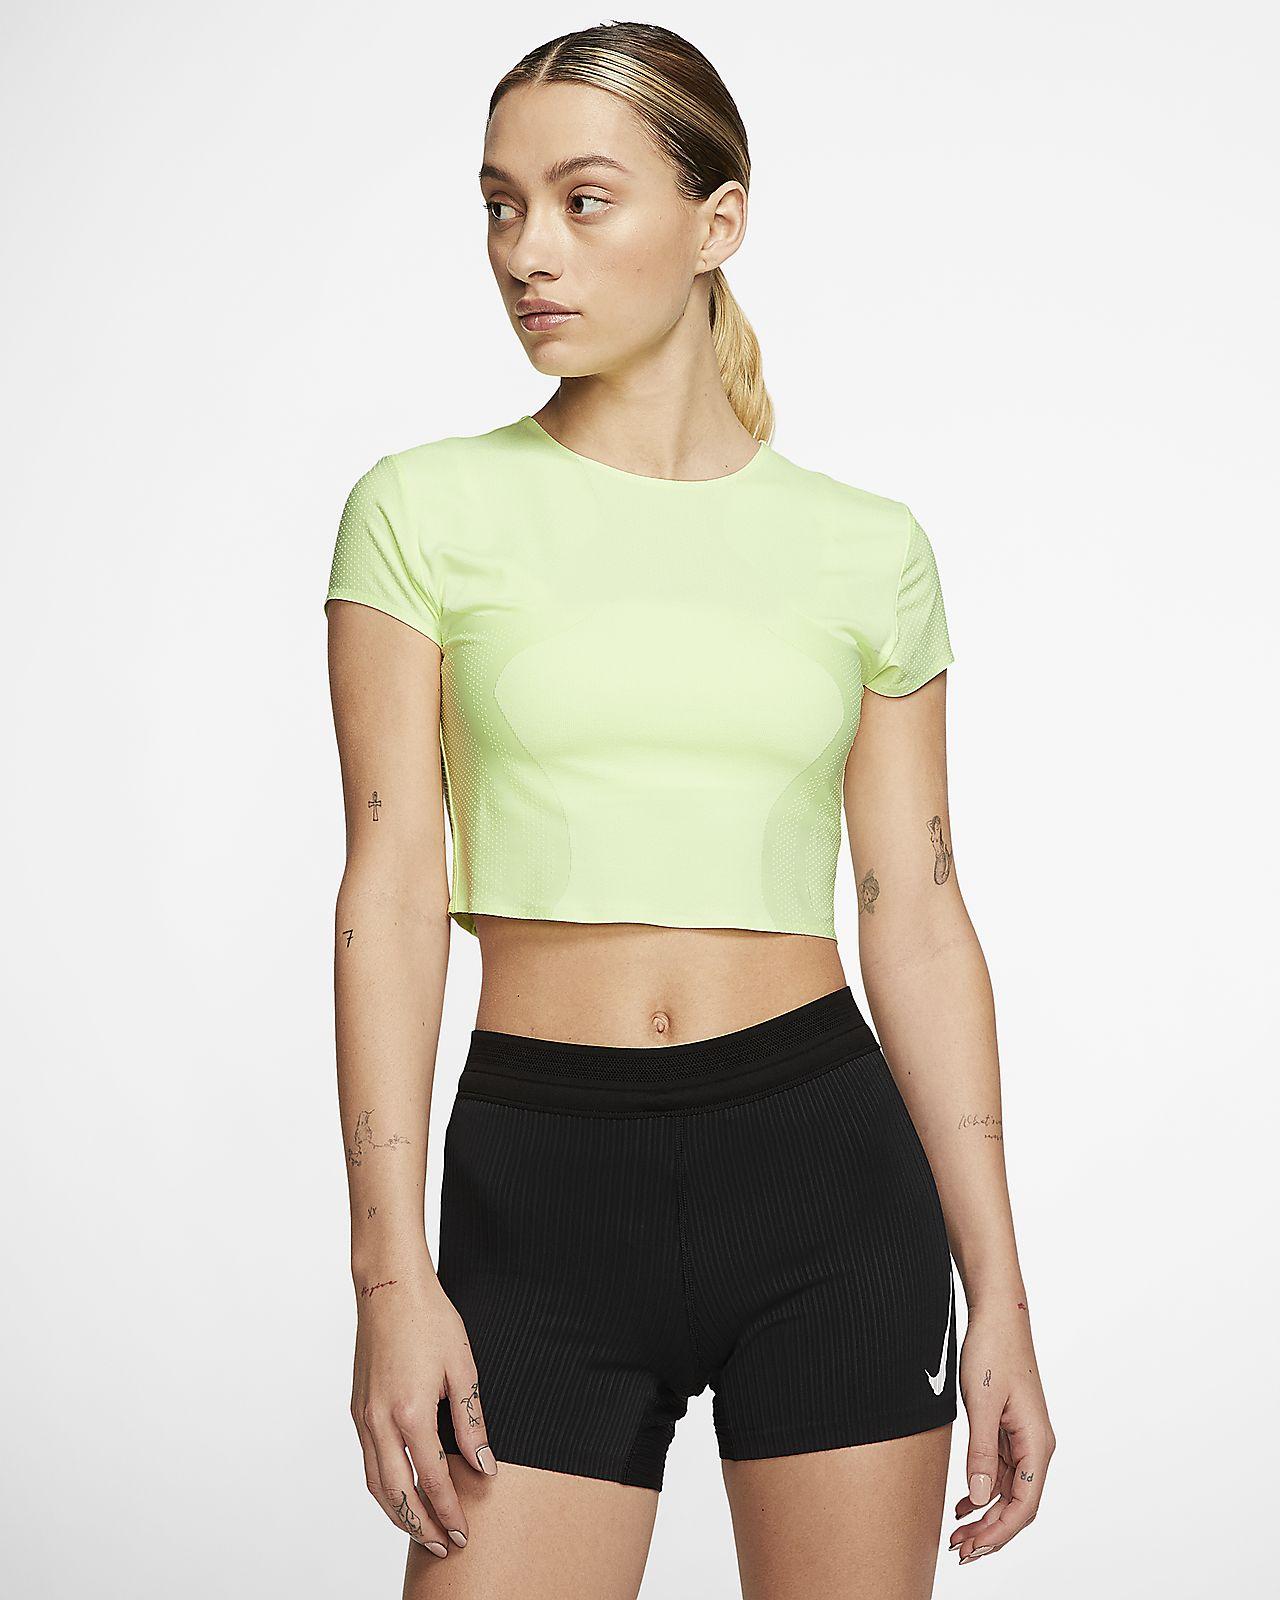 Nike City Ready Run Women's Running Top